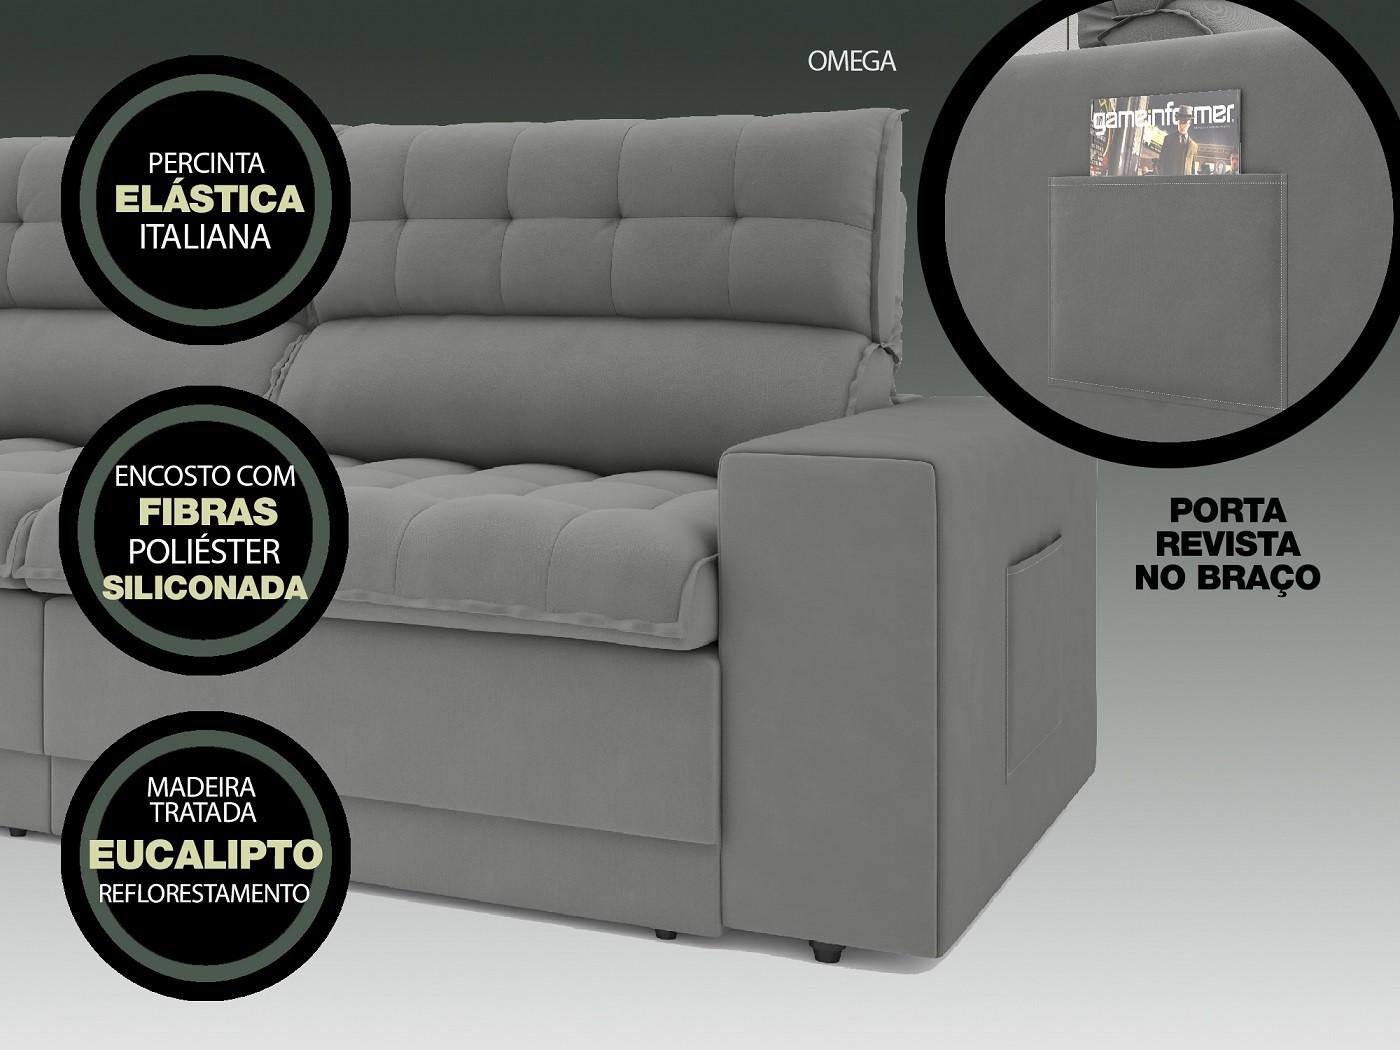 Sofá Omega 2,50m Assento Retrátil e Reclinável Velosuede Grafite - NETSOFAS  - NETSOFÁS